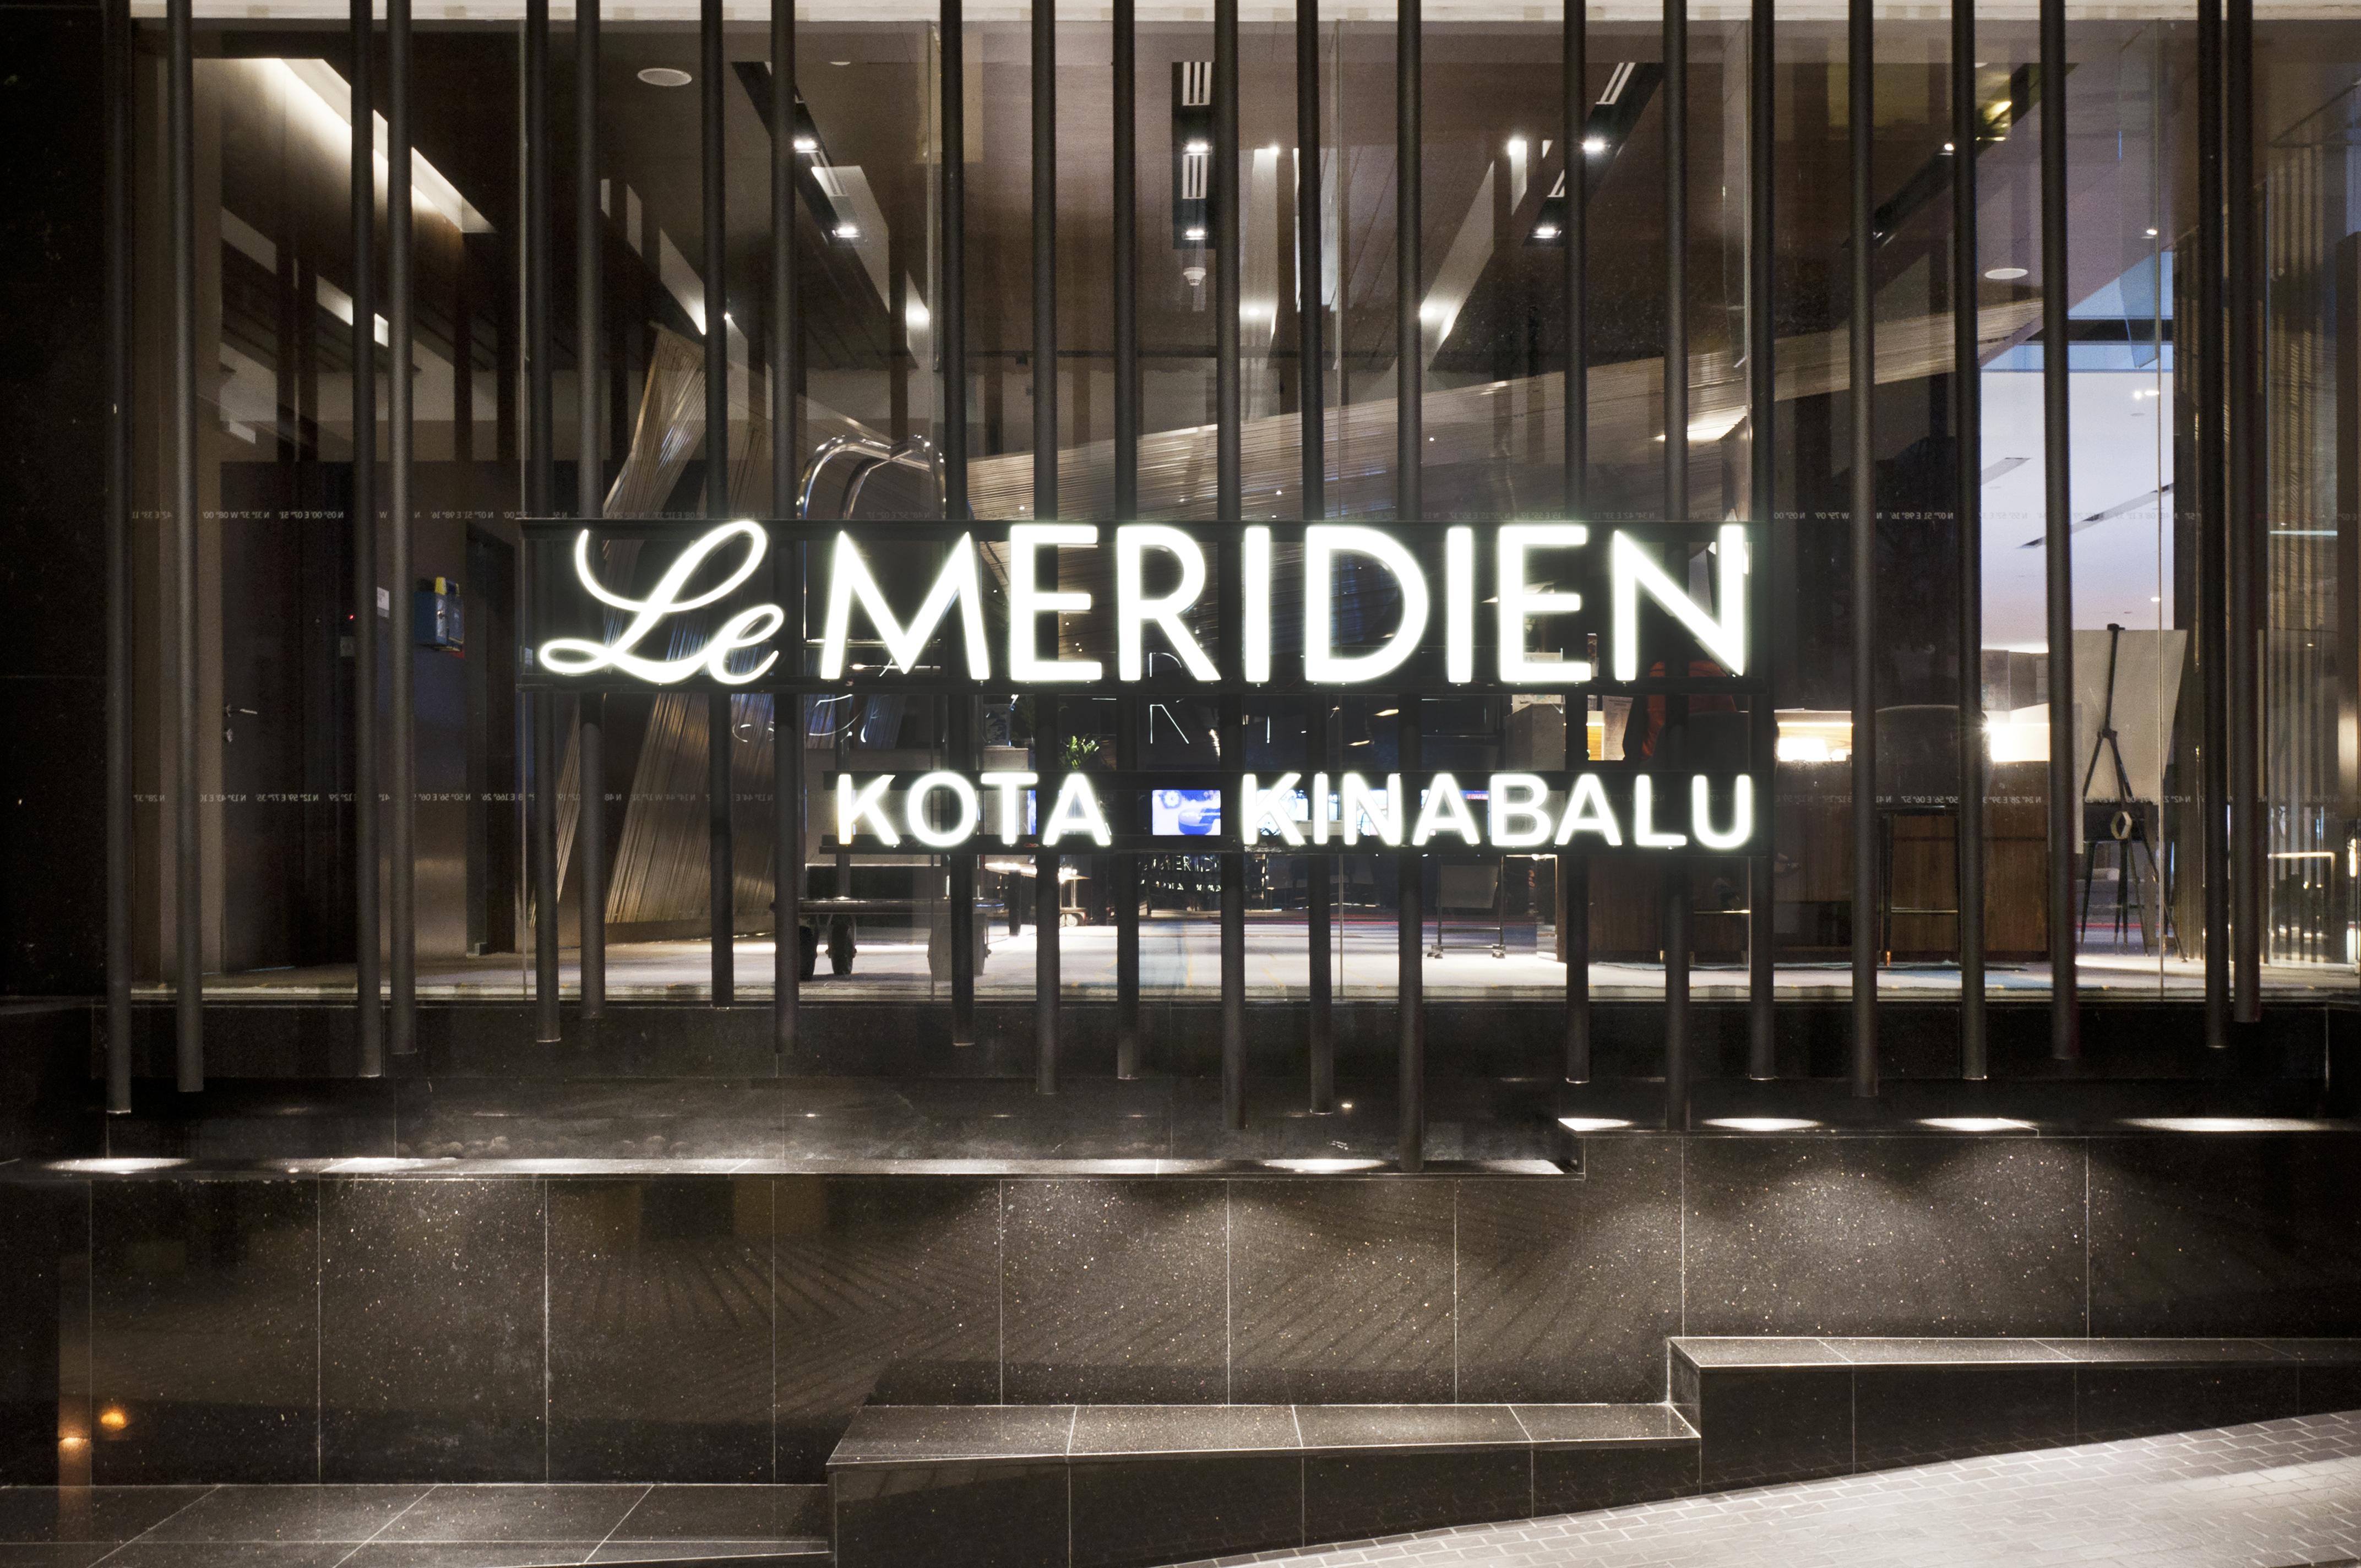 Le Meridien Kota Kinabalu Hotel